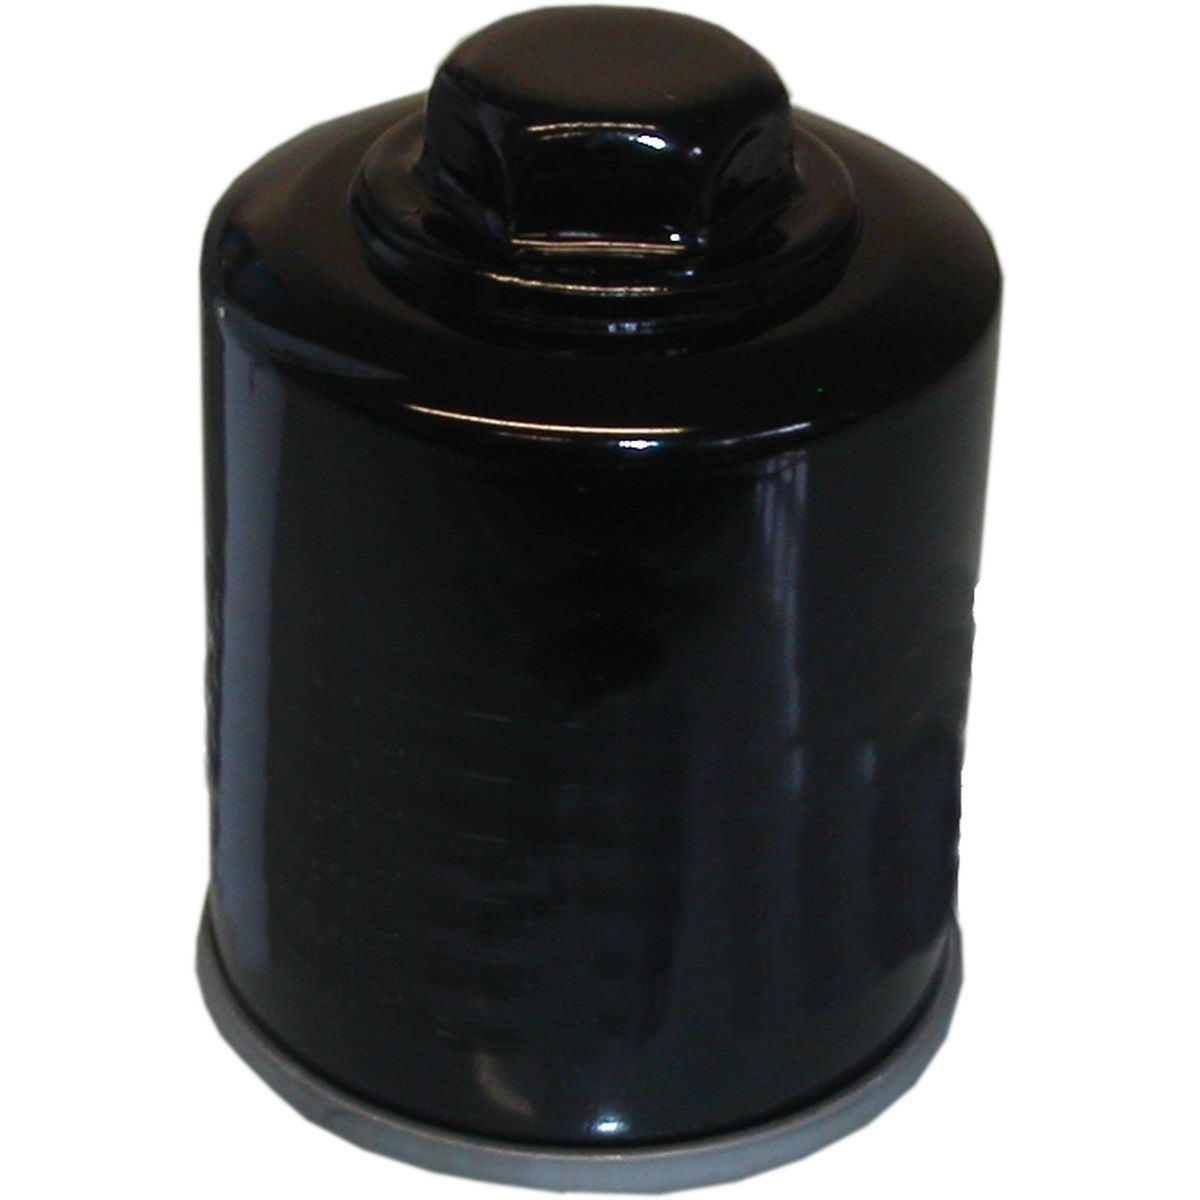 4T Oil Filter for 2001 Vespa ET4 125cc